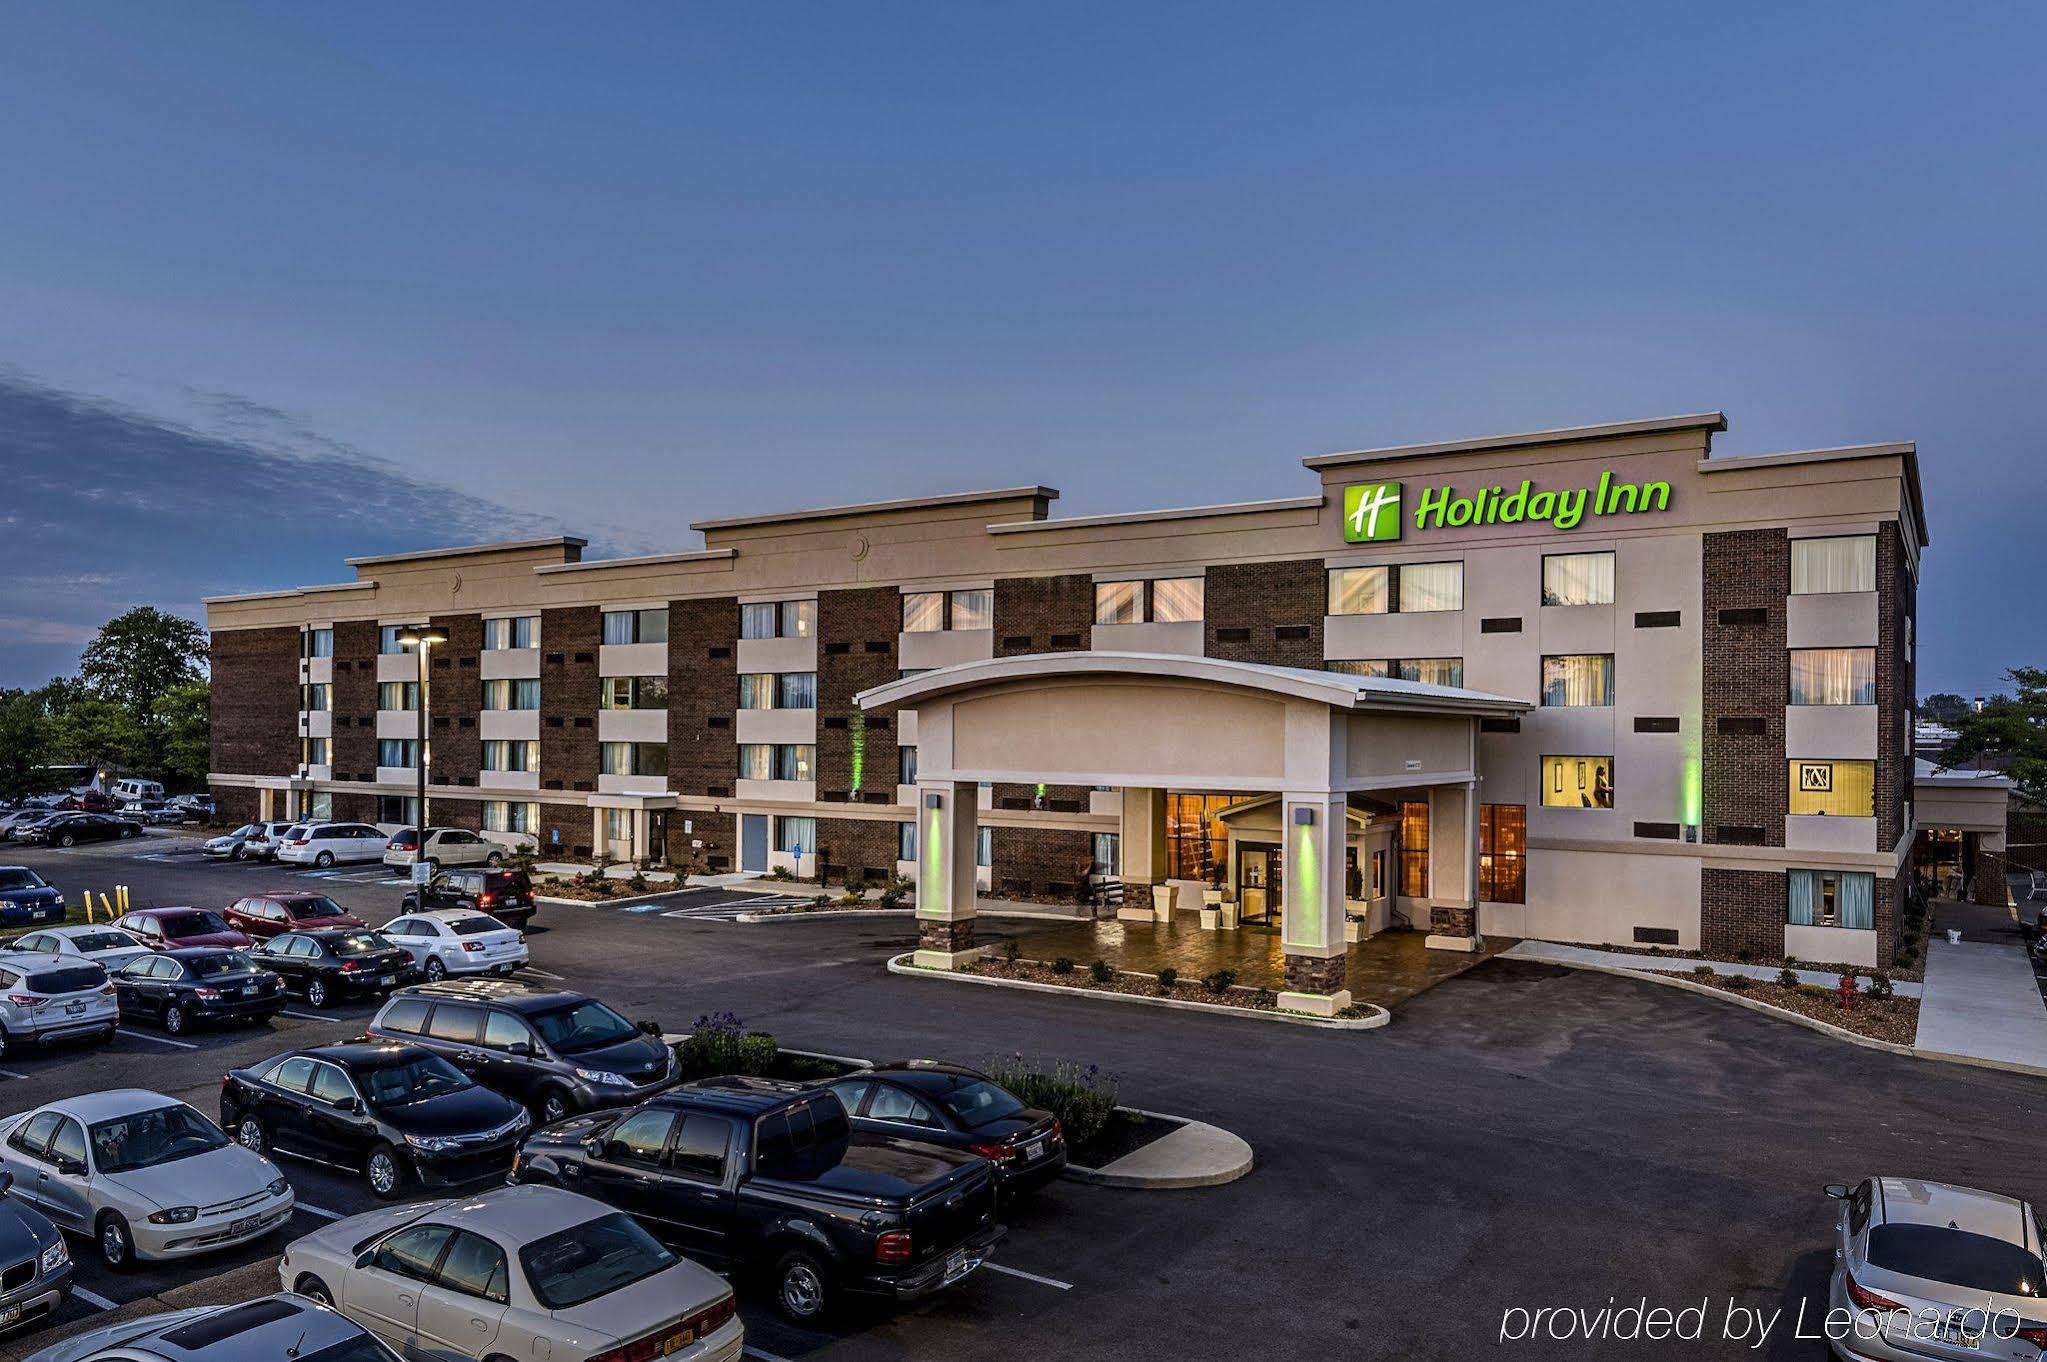 Holiday Inn Cleveland East - Mentor